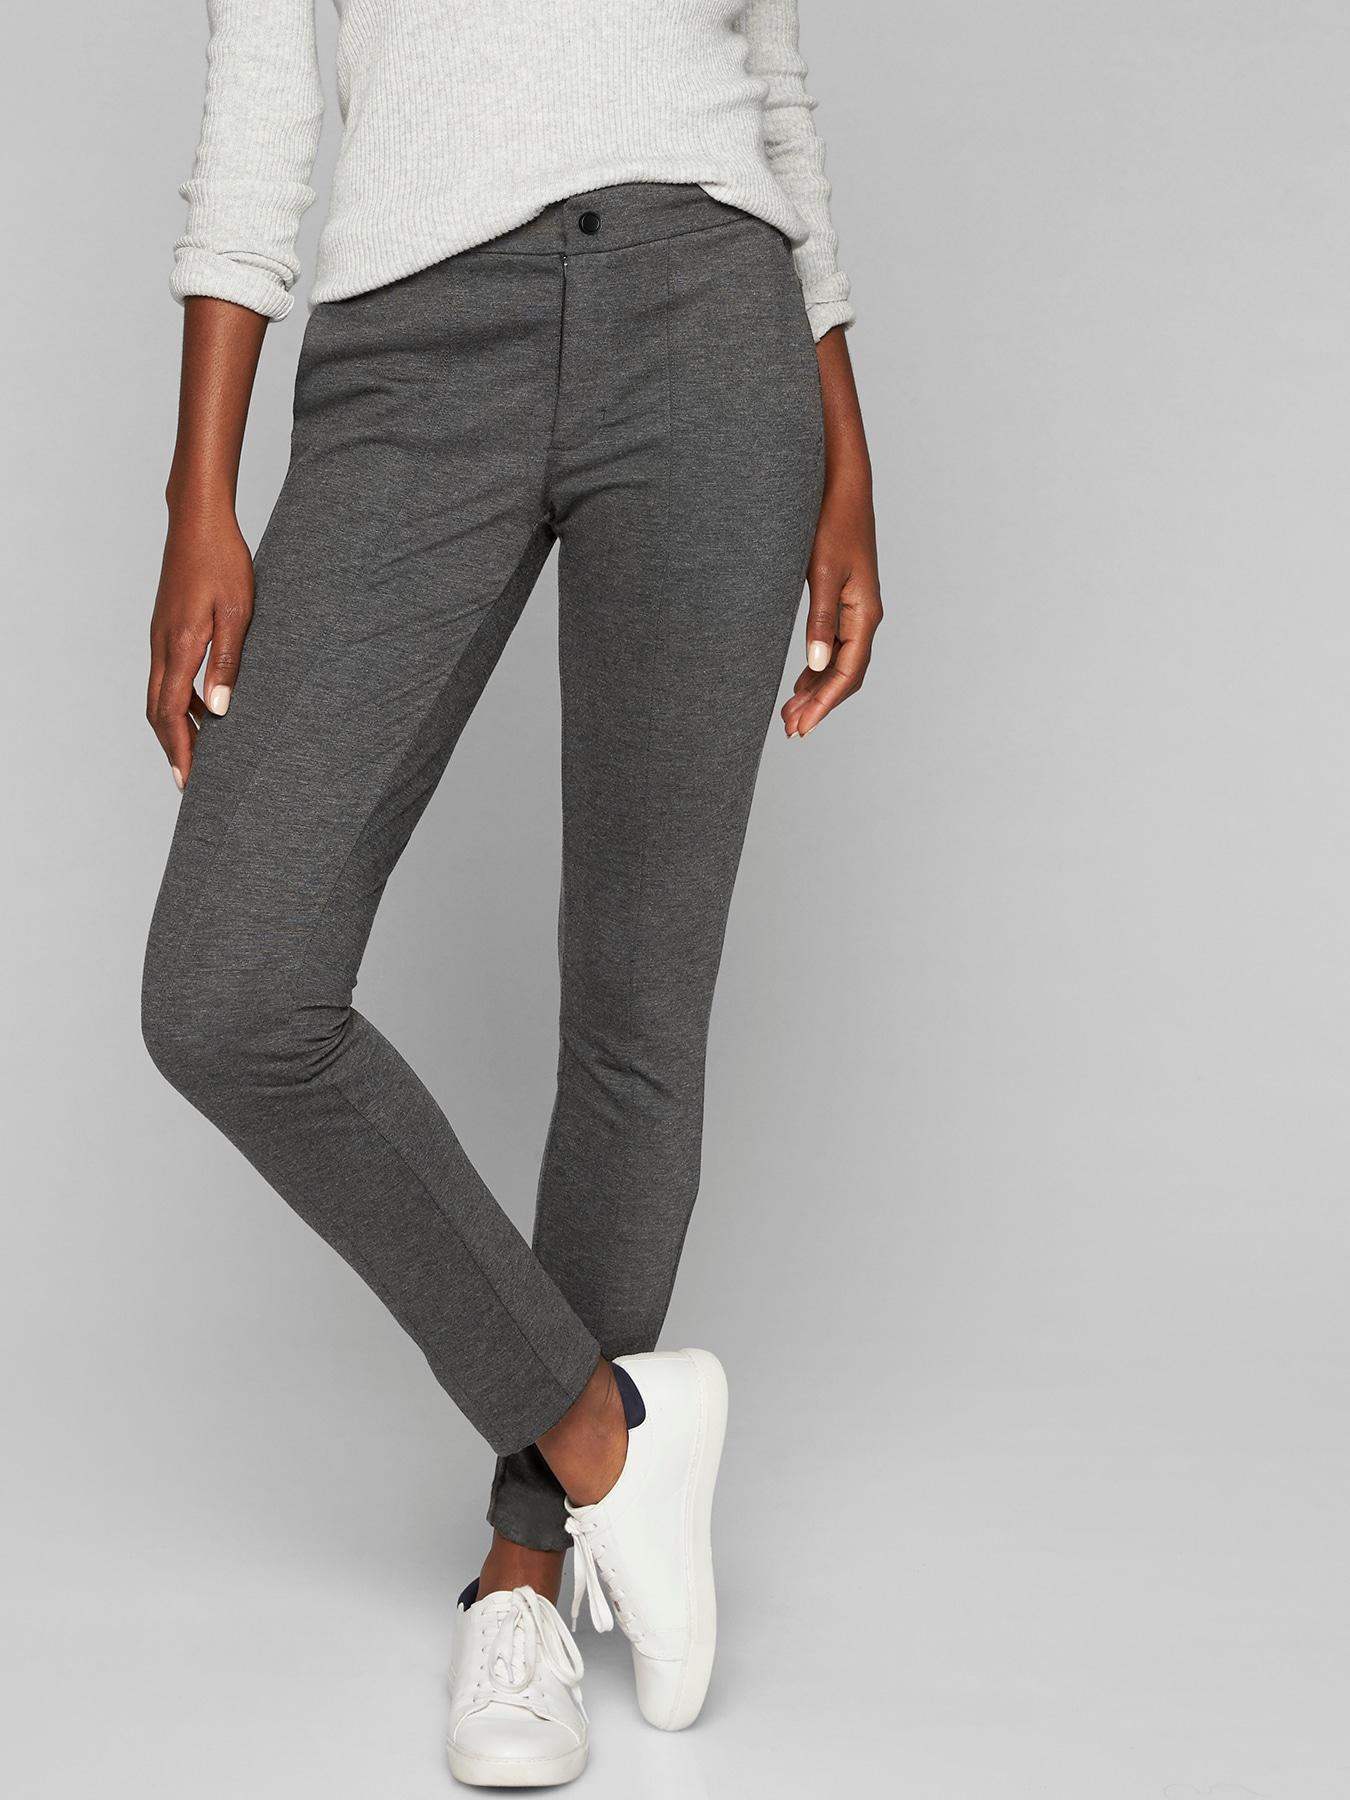 NEW Atheta Womens Ponte Skinny Pant NWT